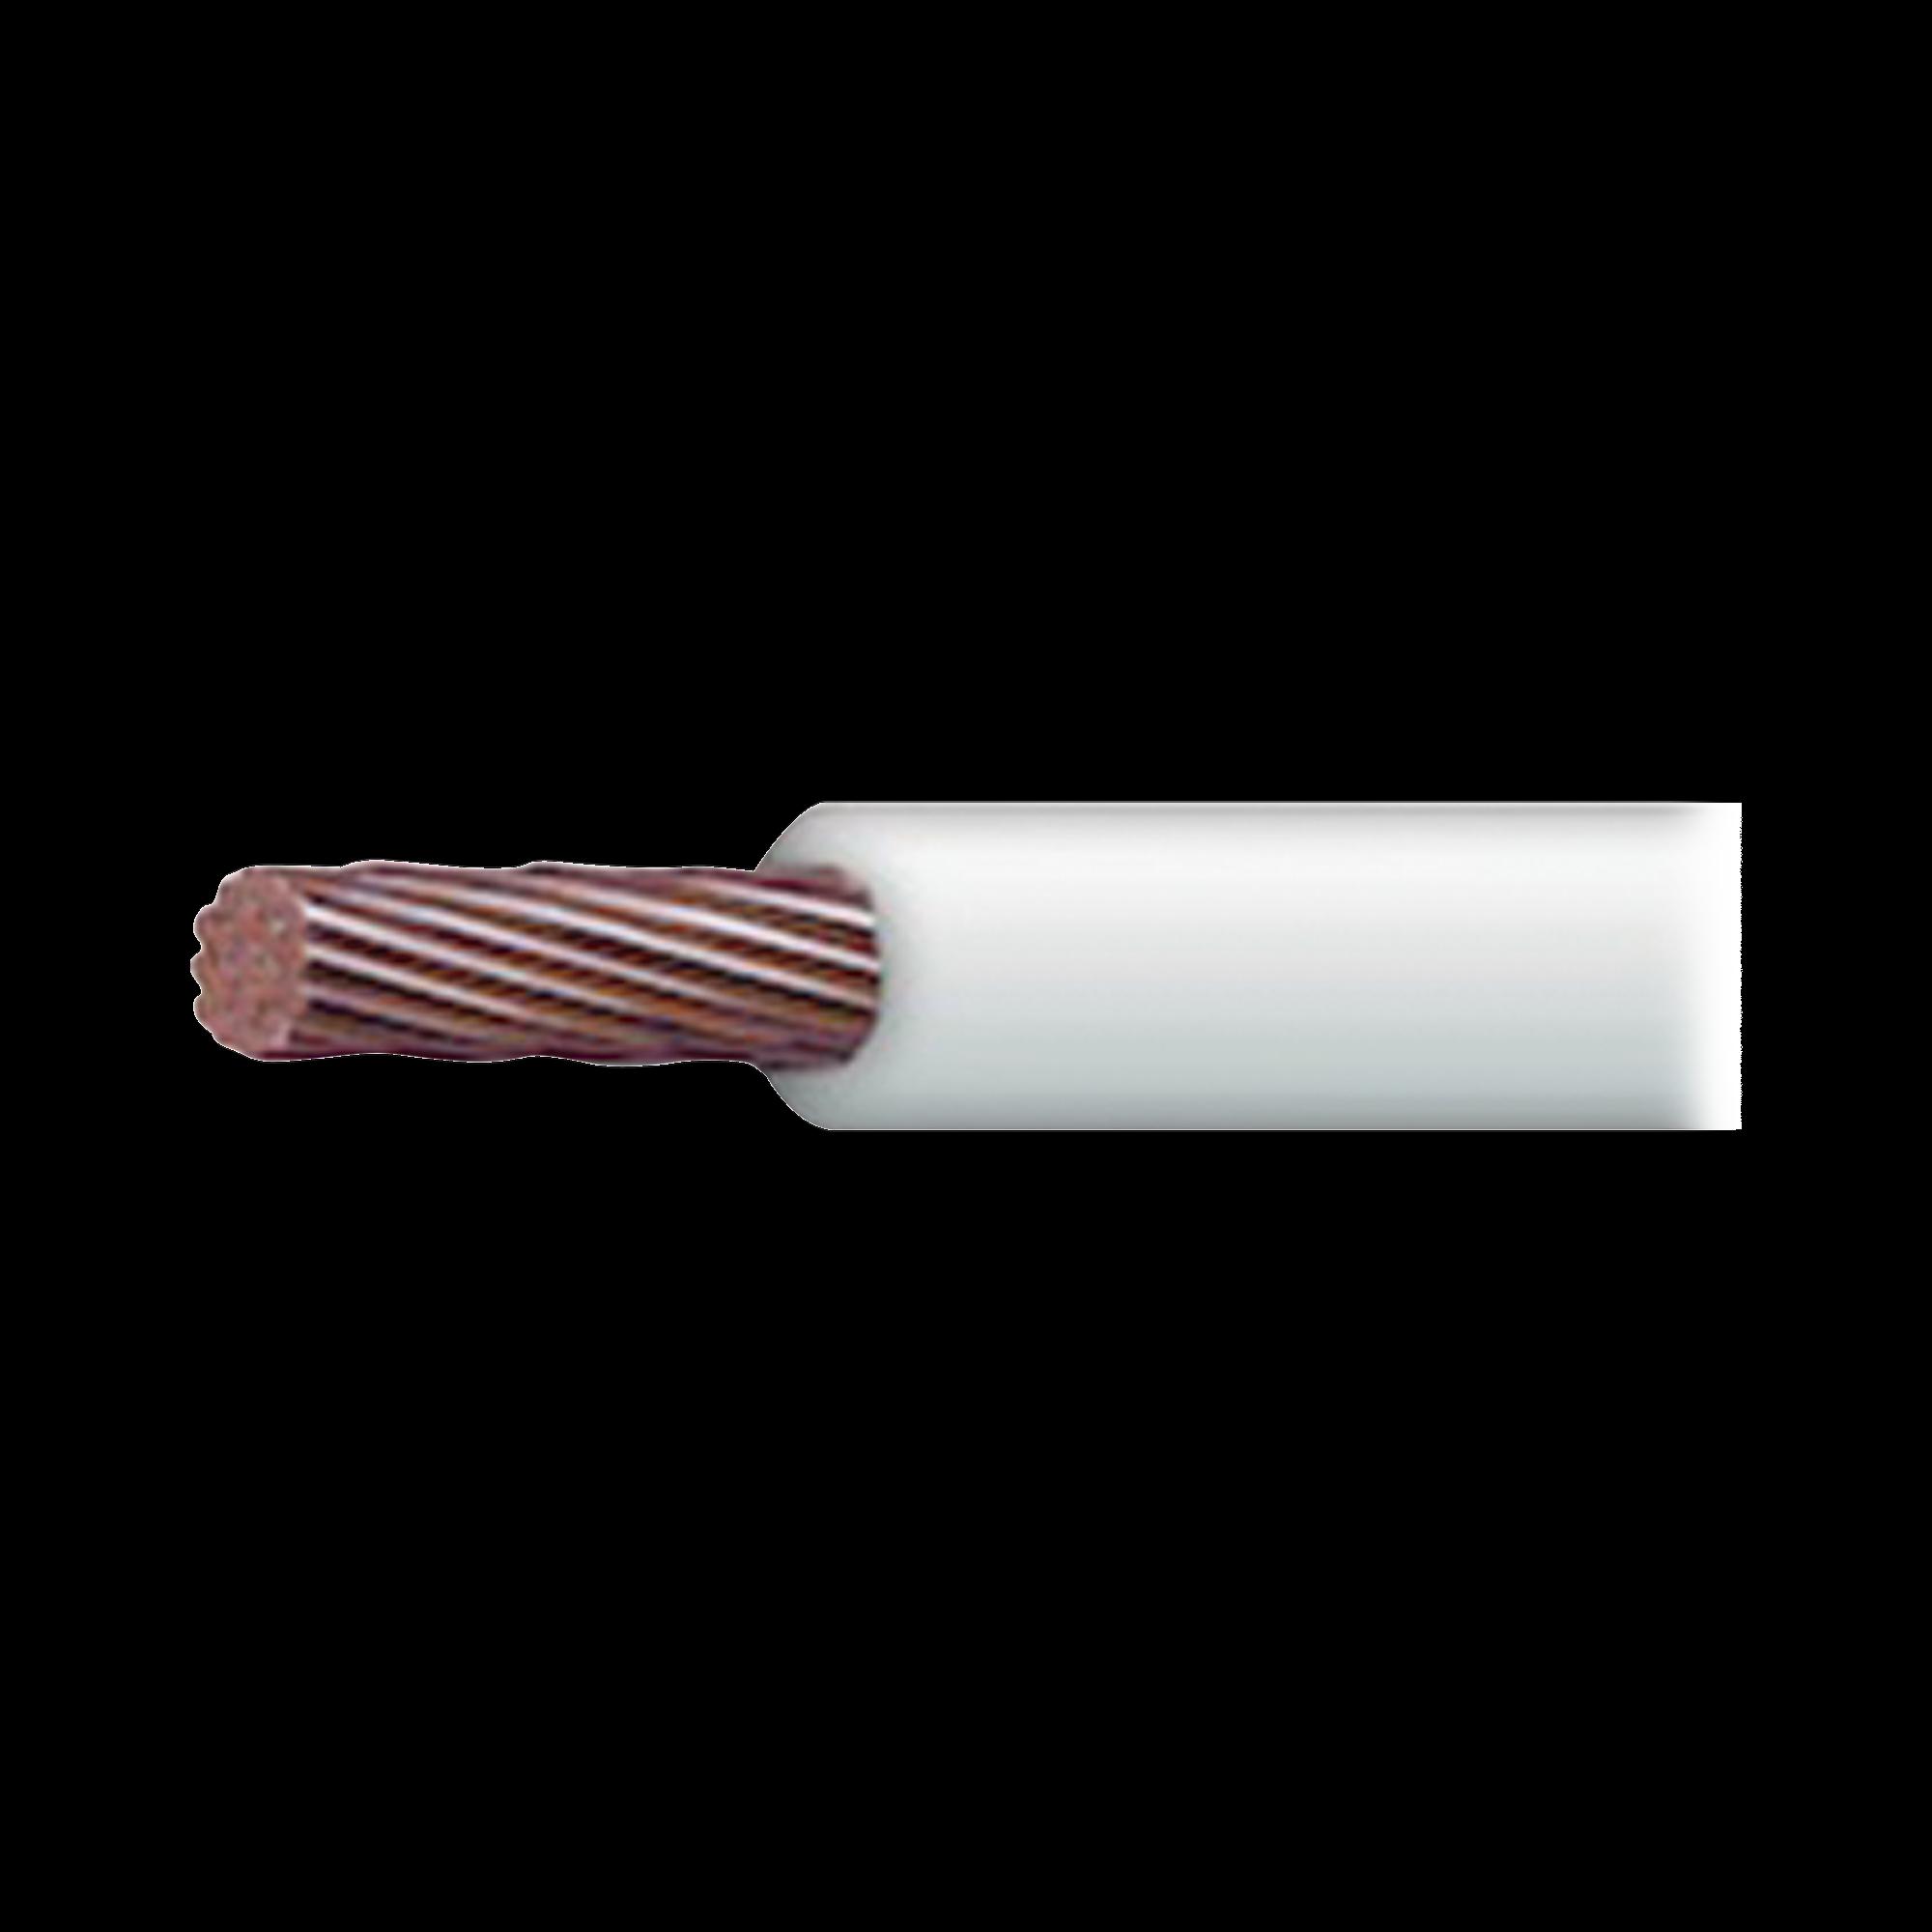 Cable 16 awg  color blanco,Conductor de cobre suave cableado. Aislamiento de PVC, auto-extinguible.BOBINA de 100 MTS